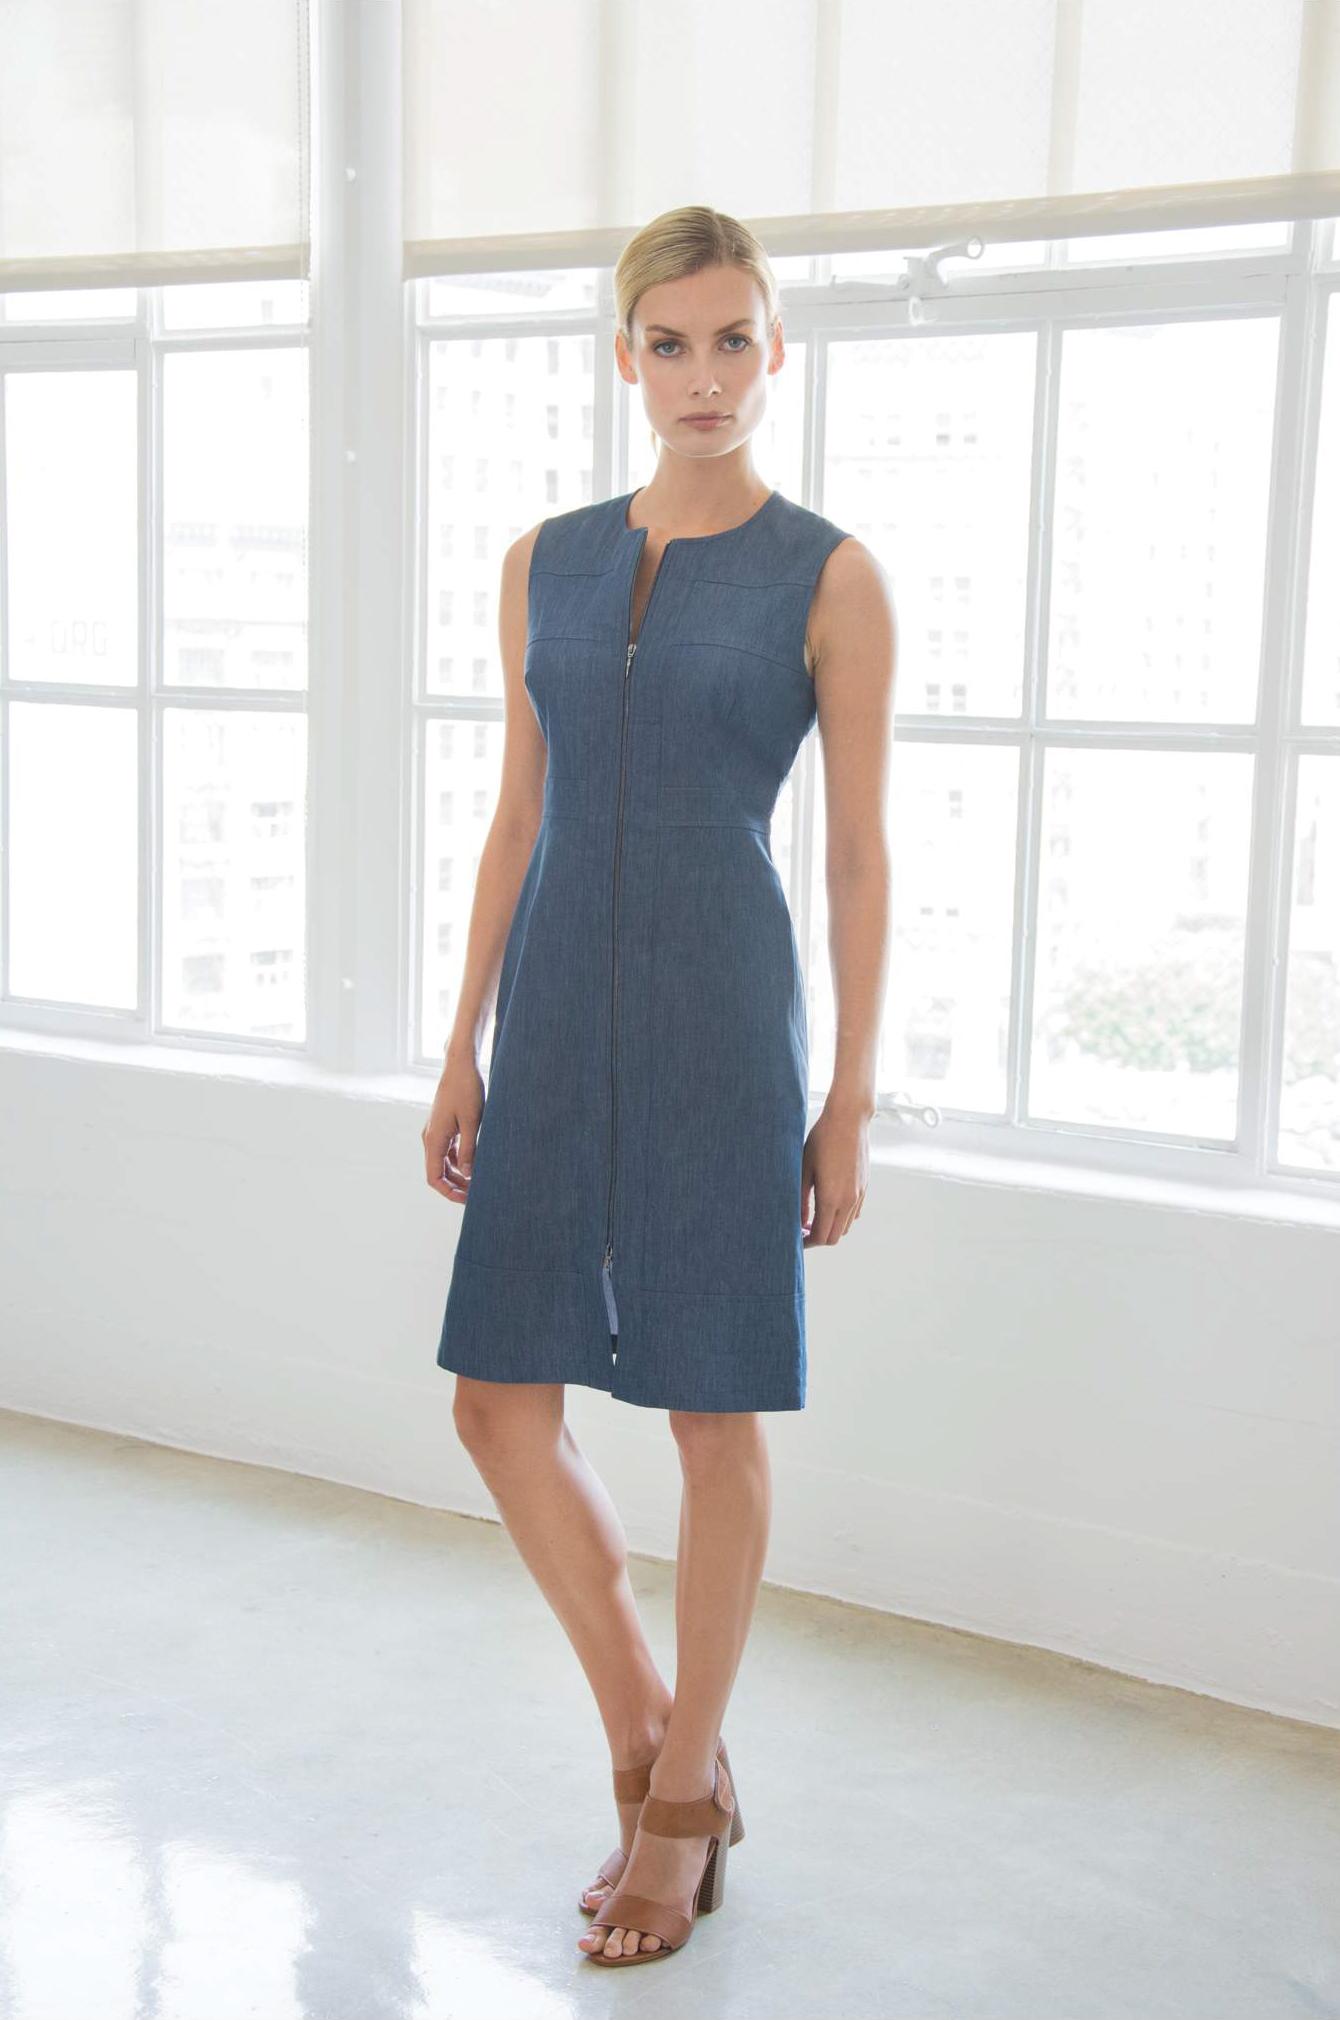 Dress: Angela - SANTORELLI